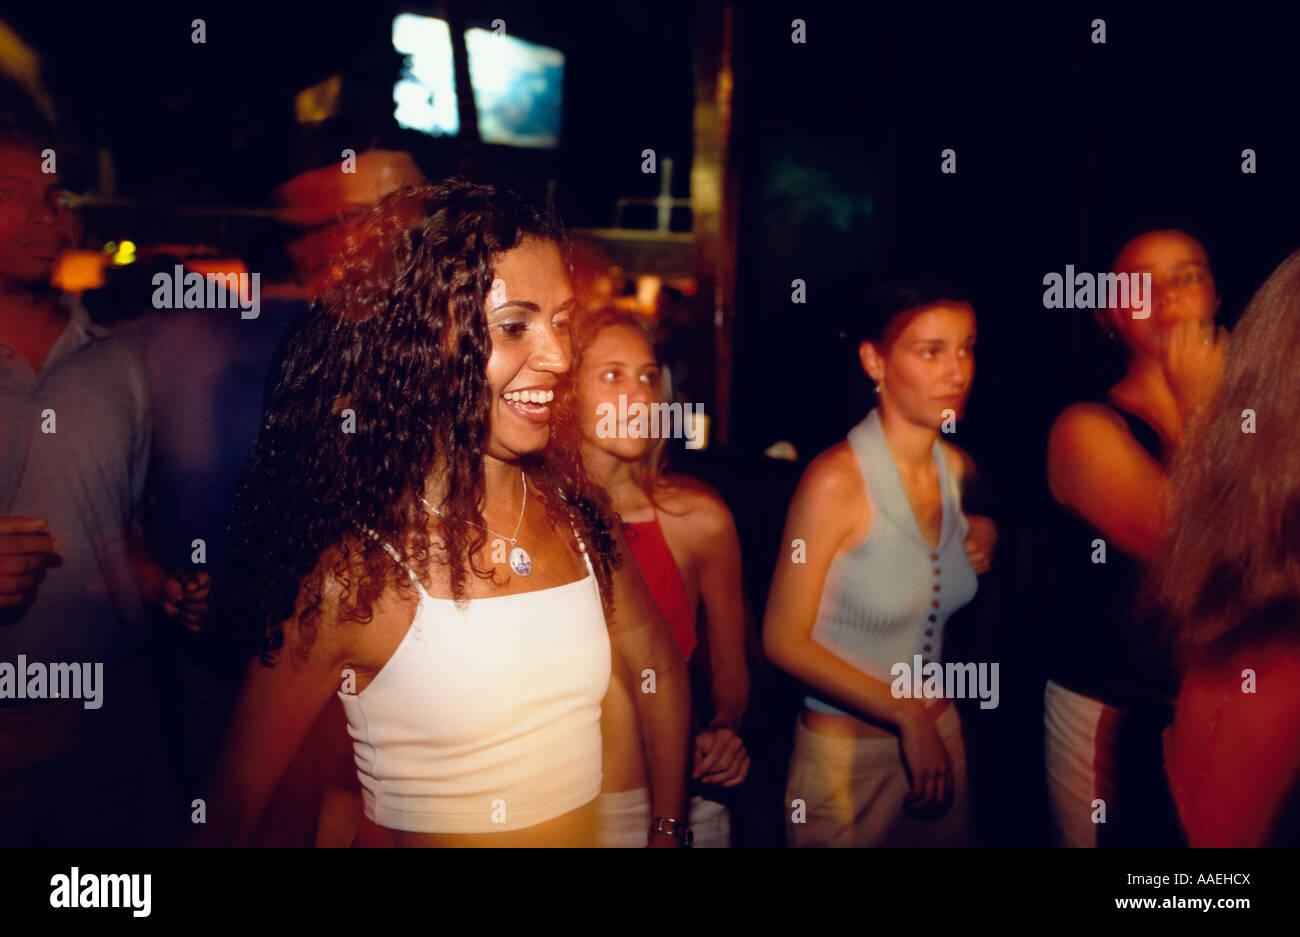 Girl dancing in La Pirata Nightclub Iracema Fortaleza Ceara Brazil Stock Photo